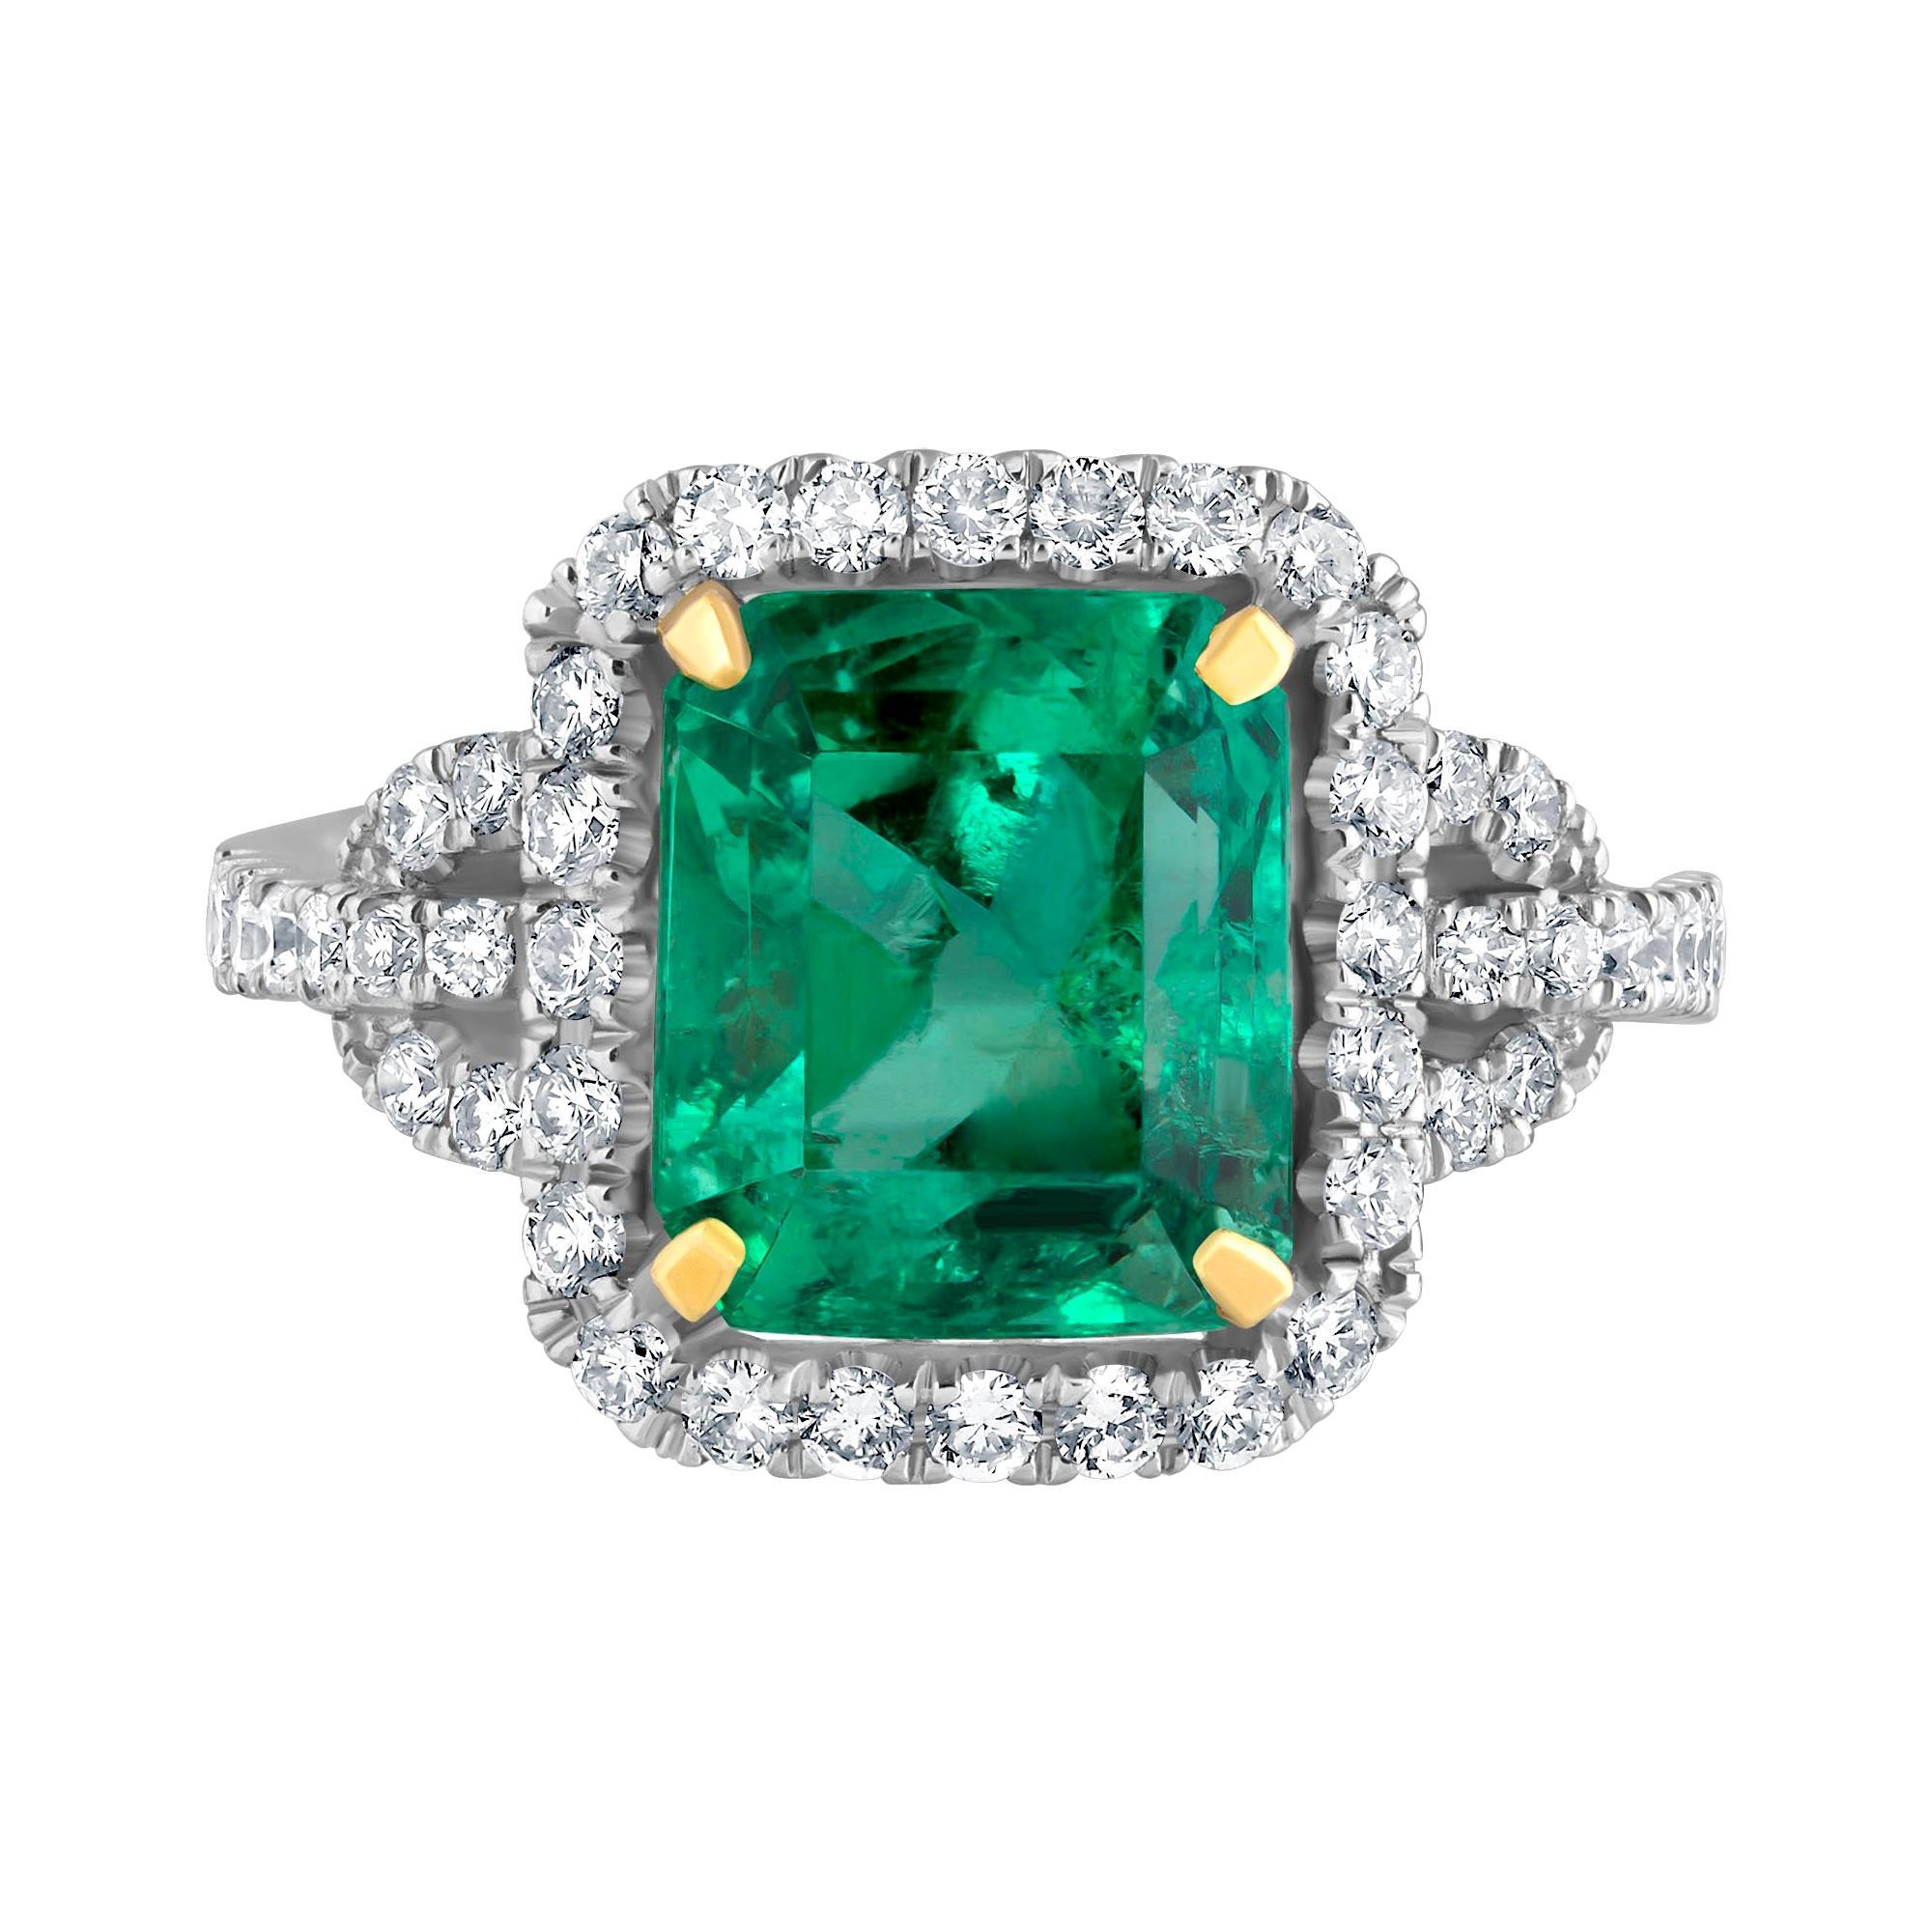 Emilio Jewelry Certified Colombian Emerald Diamond Ring